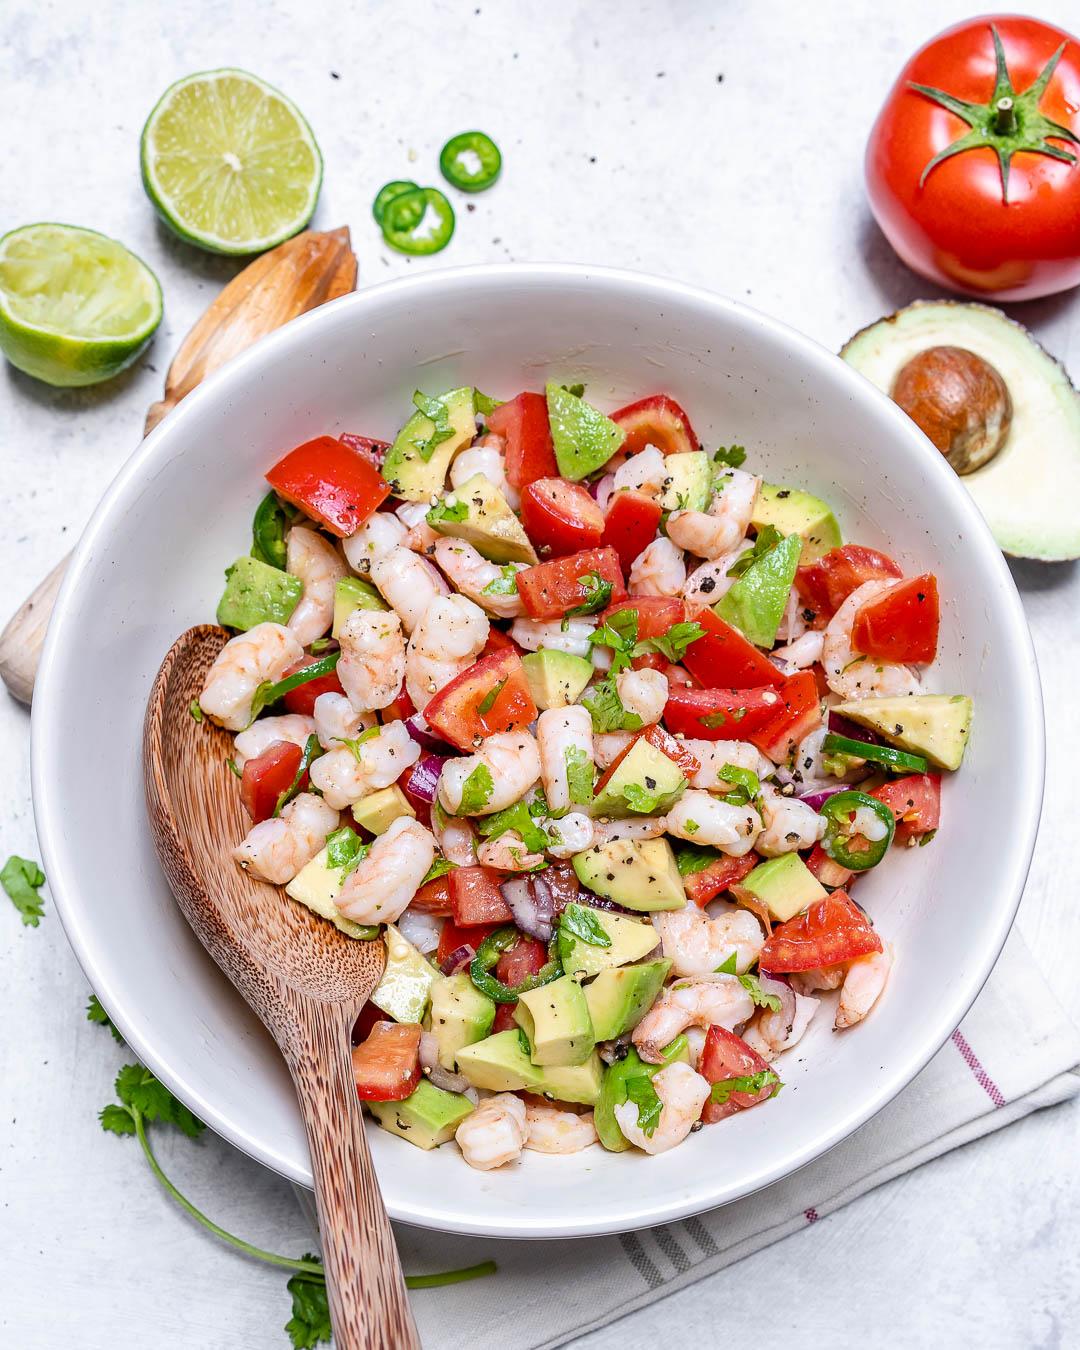 Cilantro Lime Shrimp Ceviche Chopped Salad